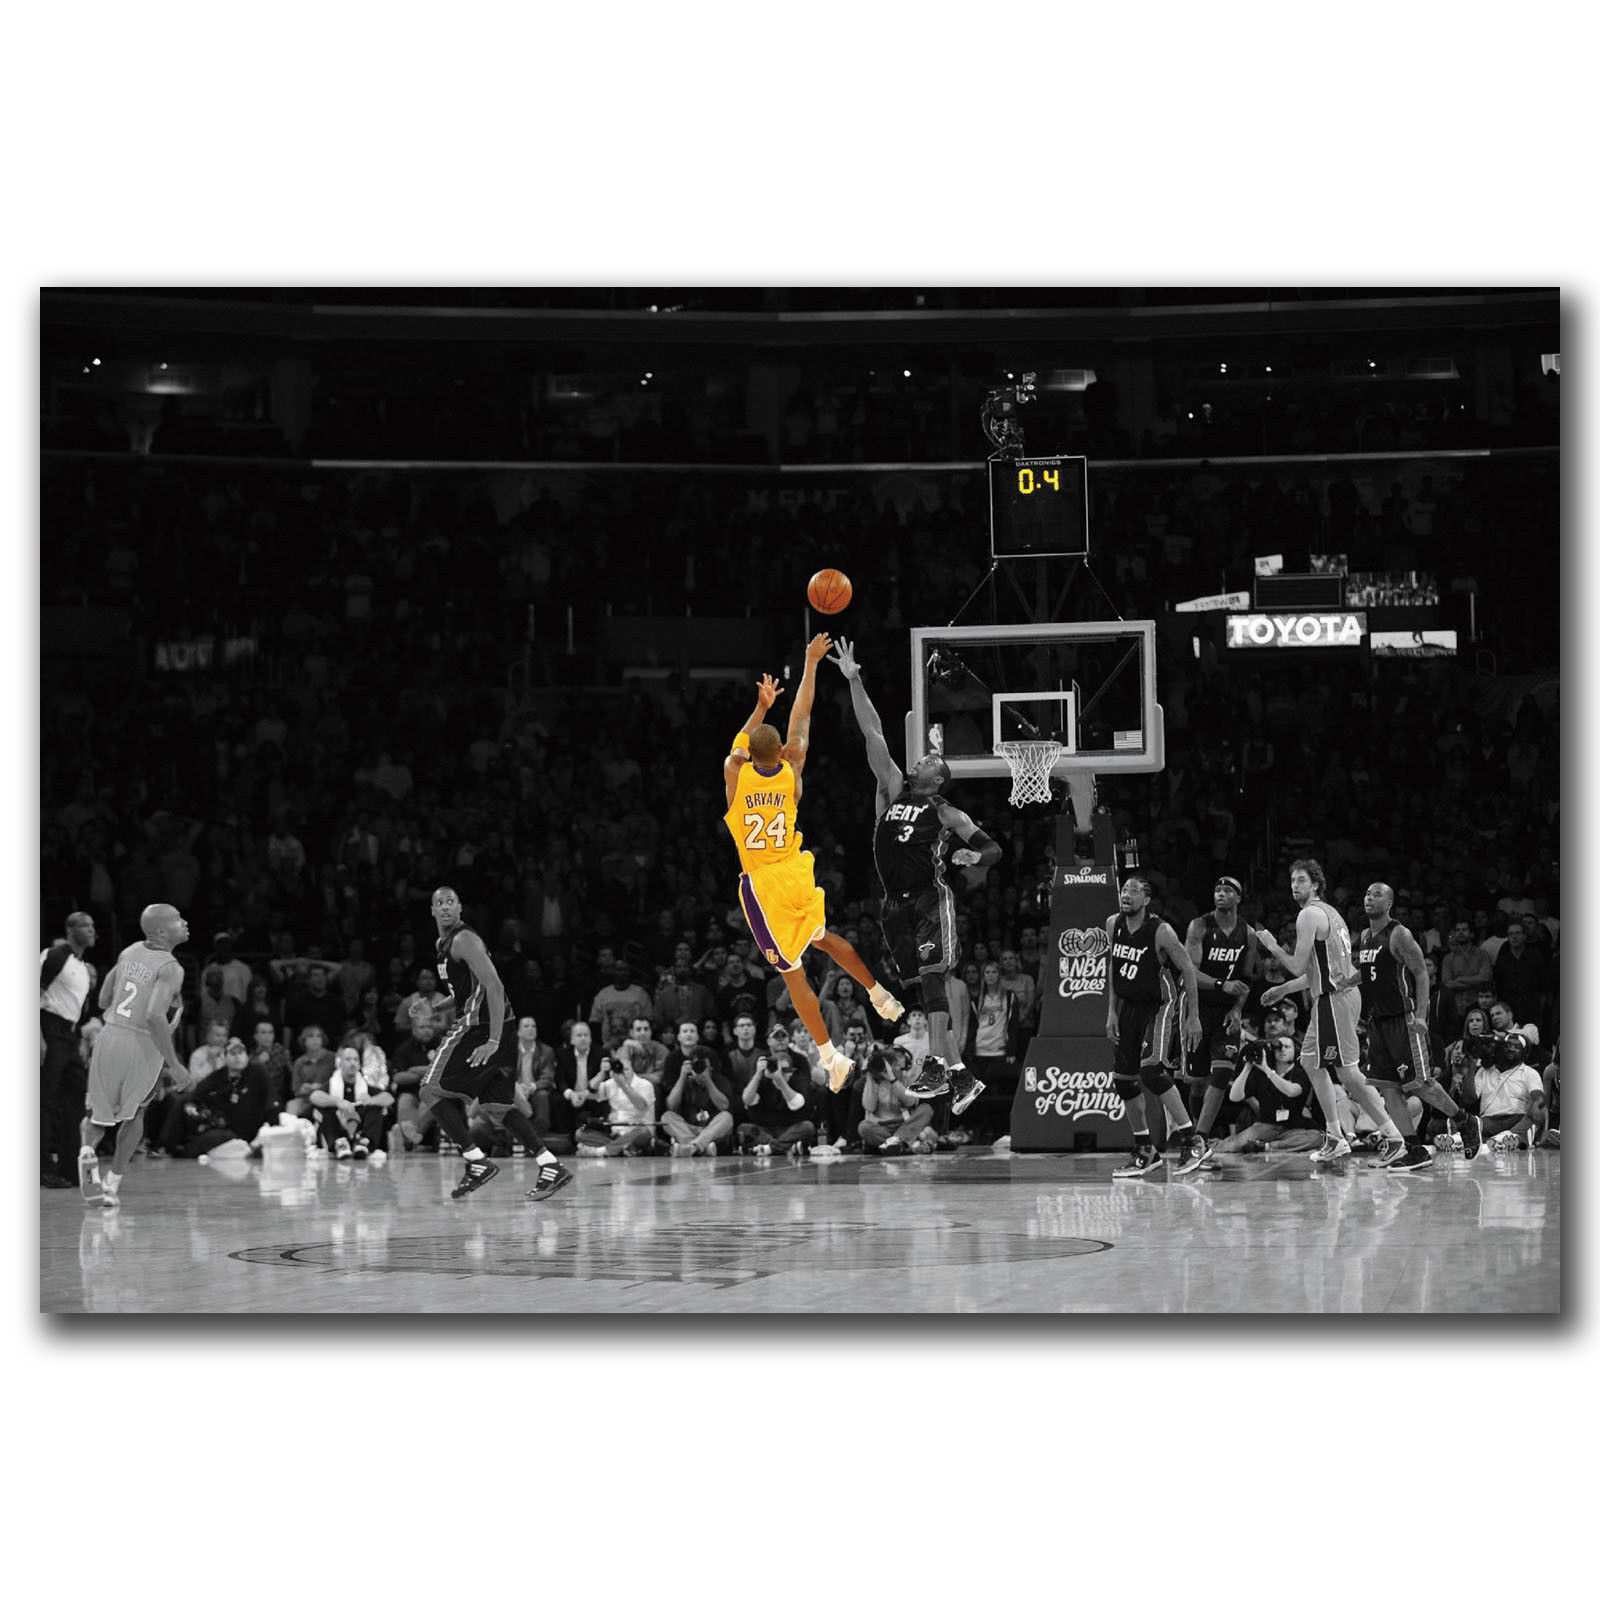 Q0913 pósteres e impresiones Kobe Bryant baloncesto LeBron James Hot 18 24x36in Póster Artístico de lienzo pintura decoración del hogar